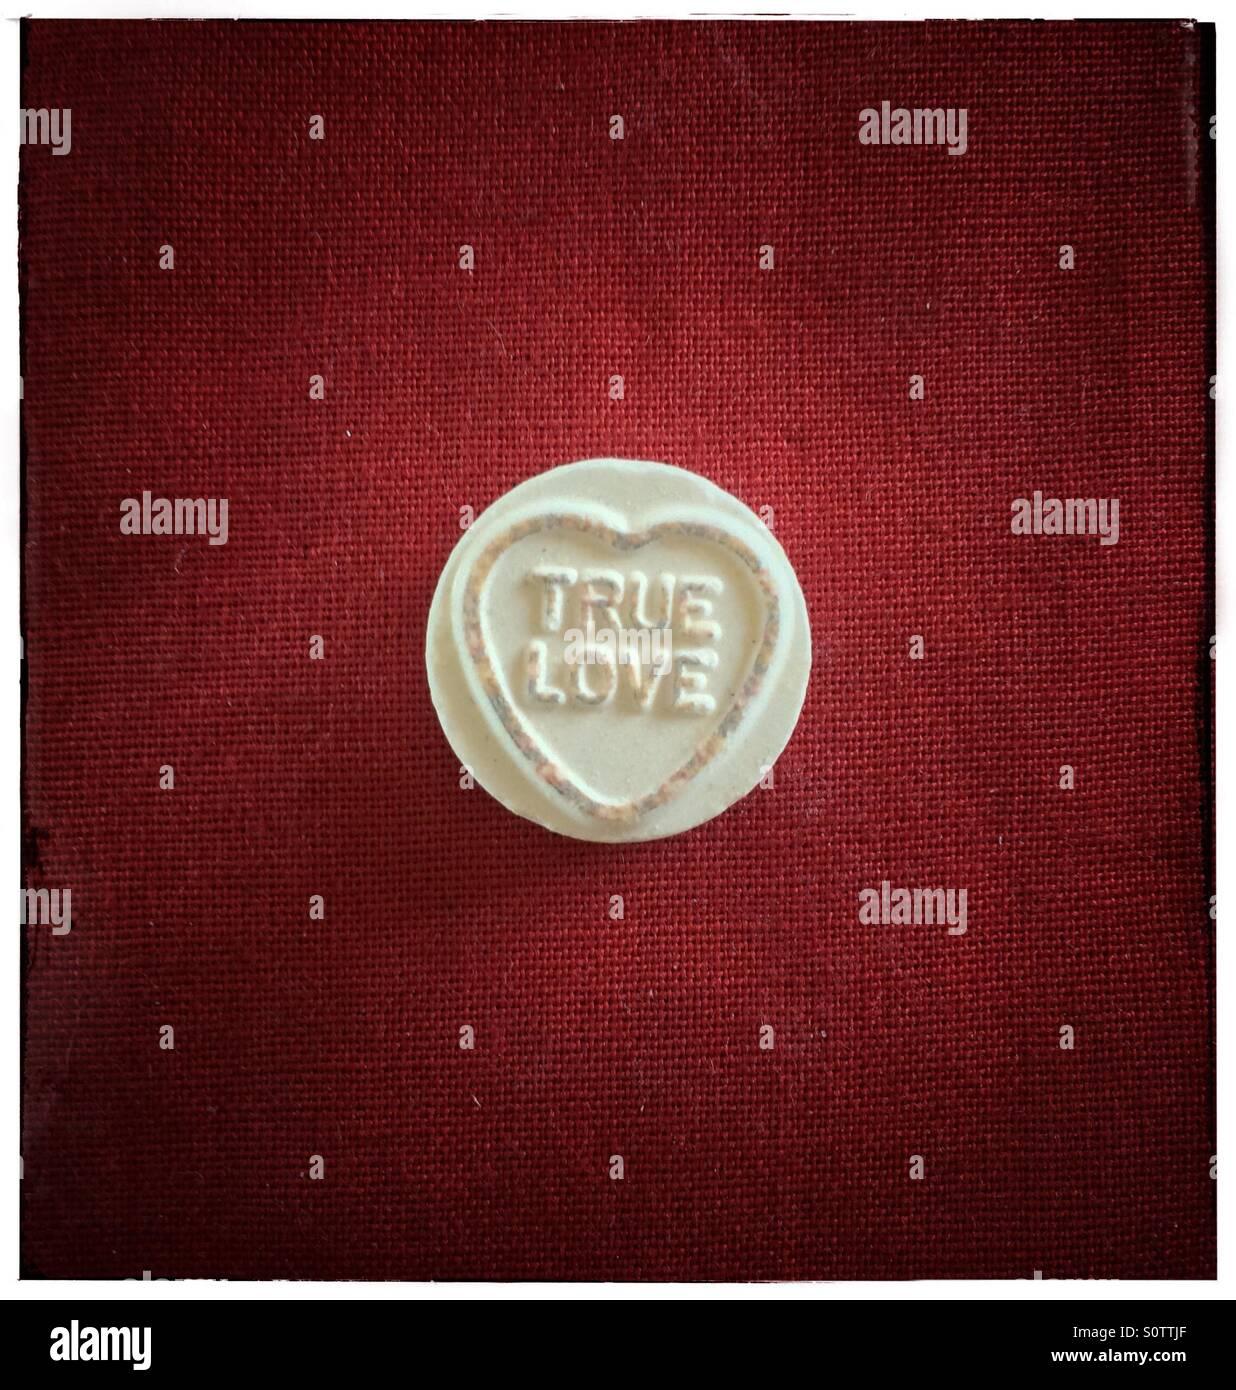 True love, loveheart sweet. - Stock Image